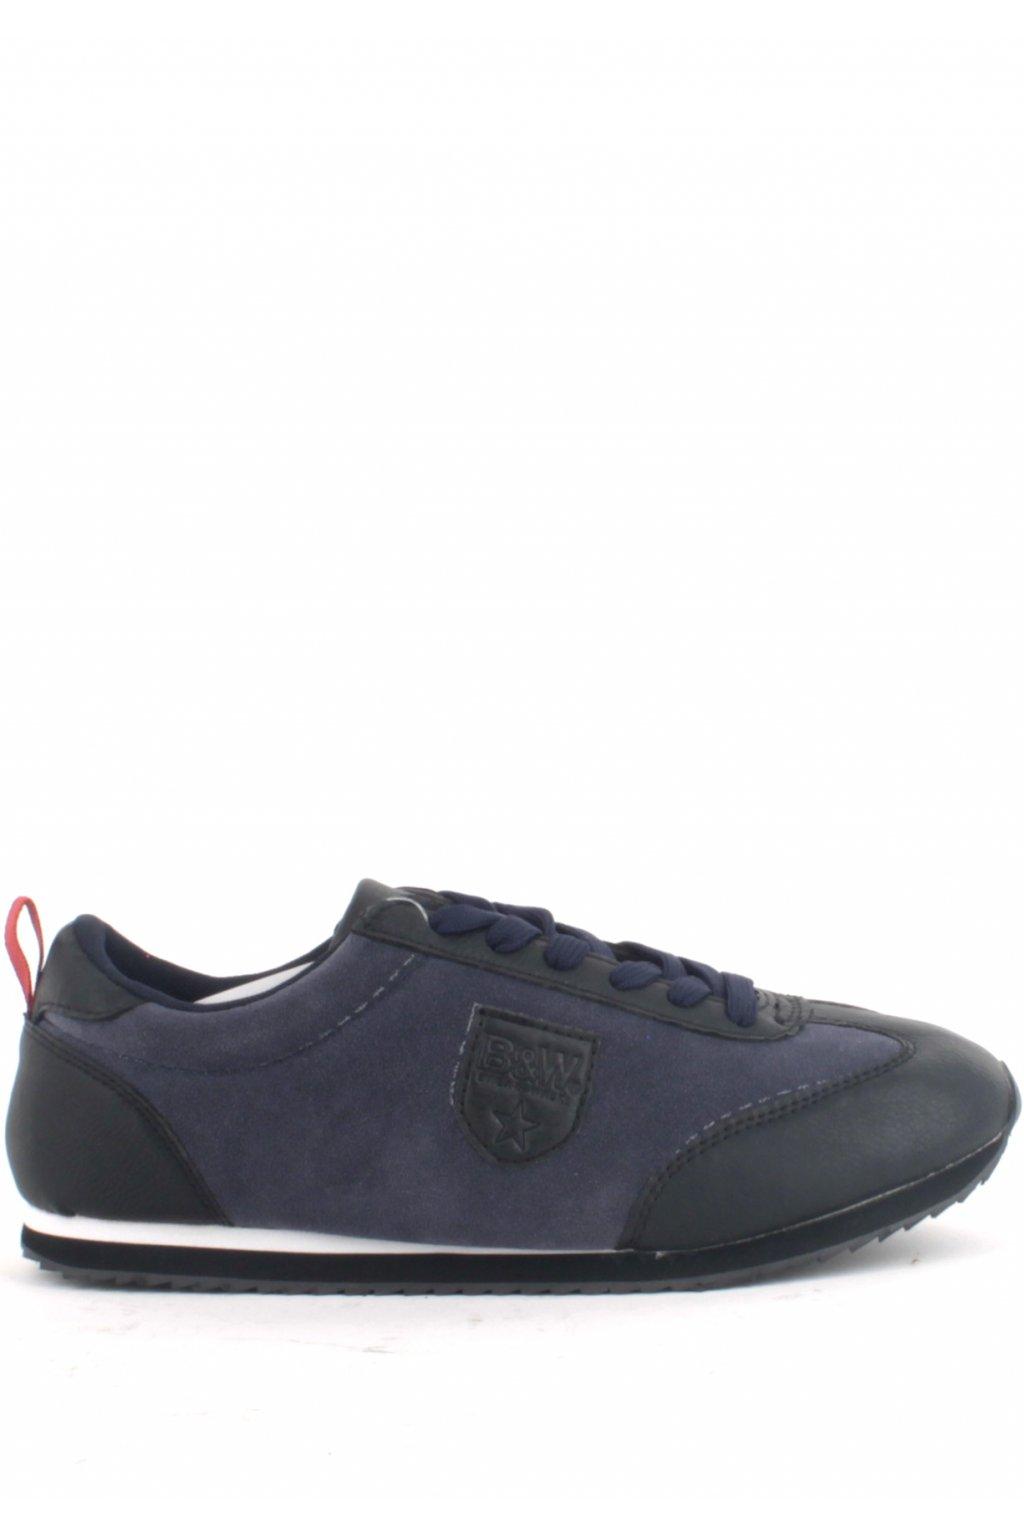 Modré pánské tenisky Break&Walk